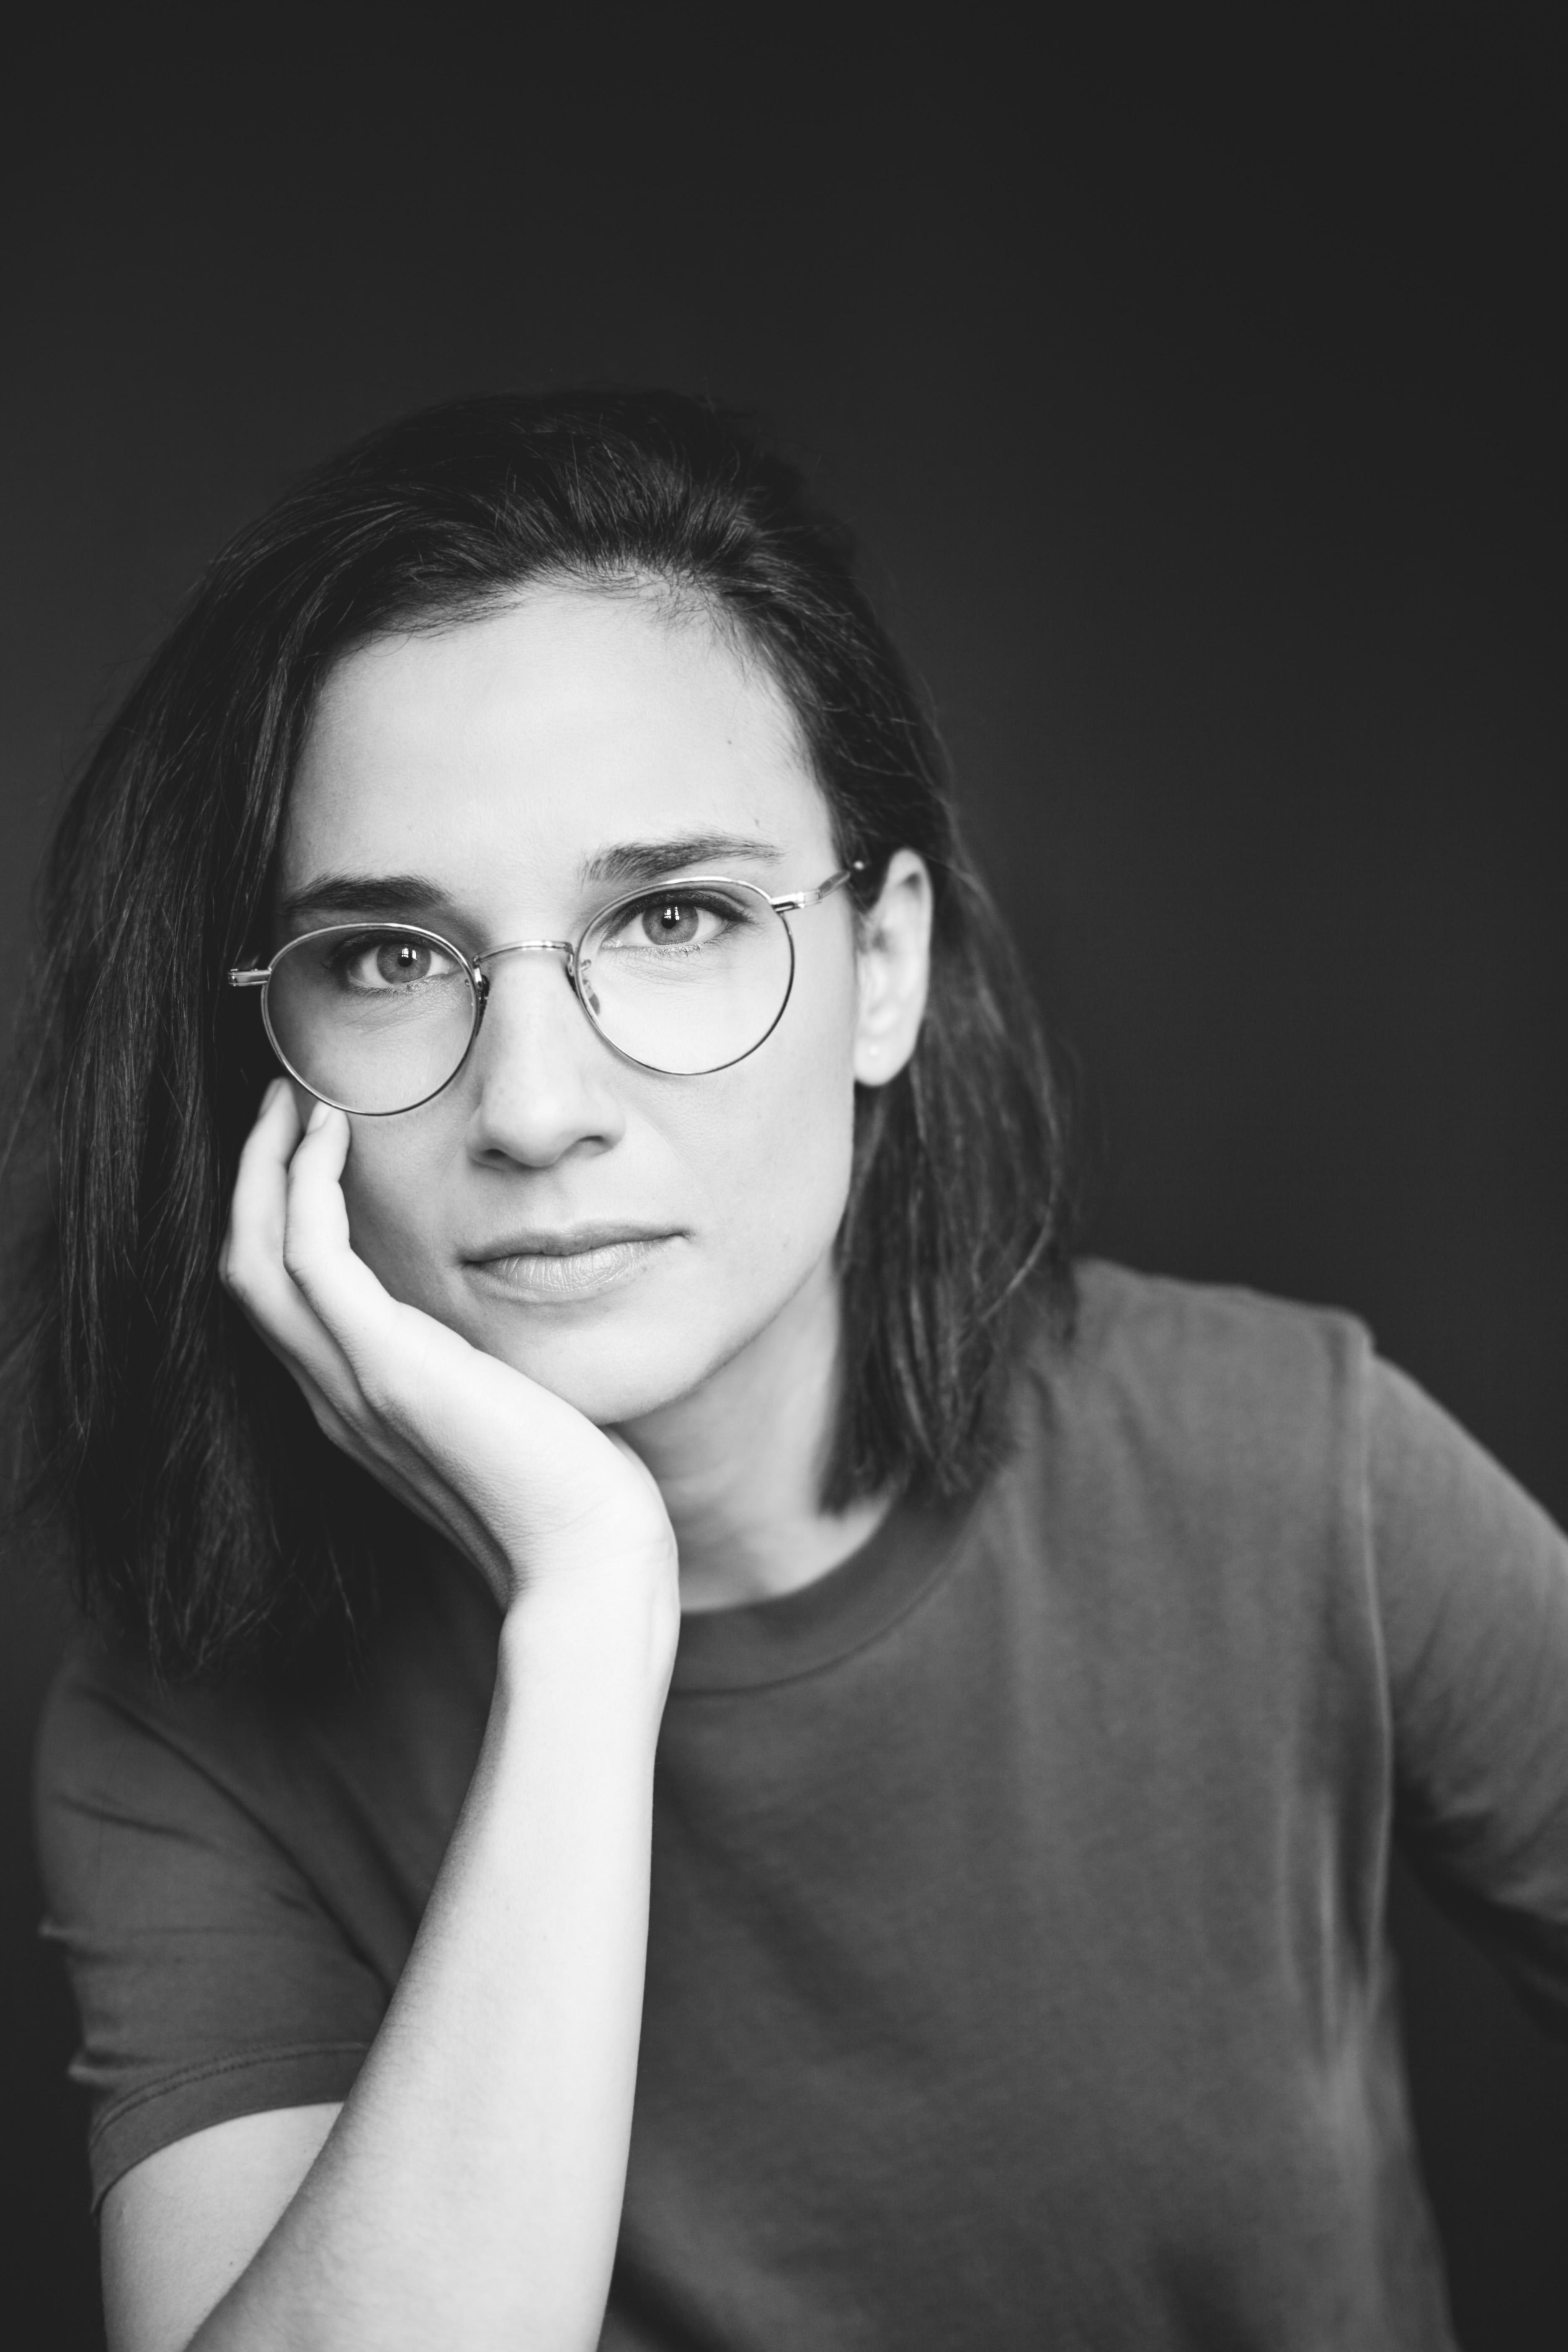 Chloe Robichaud